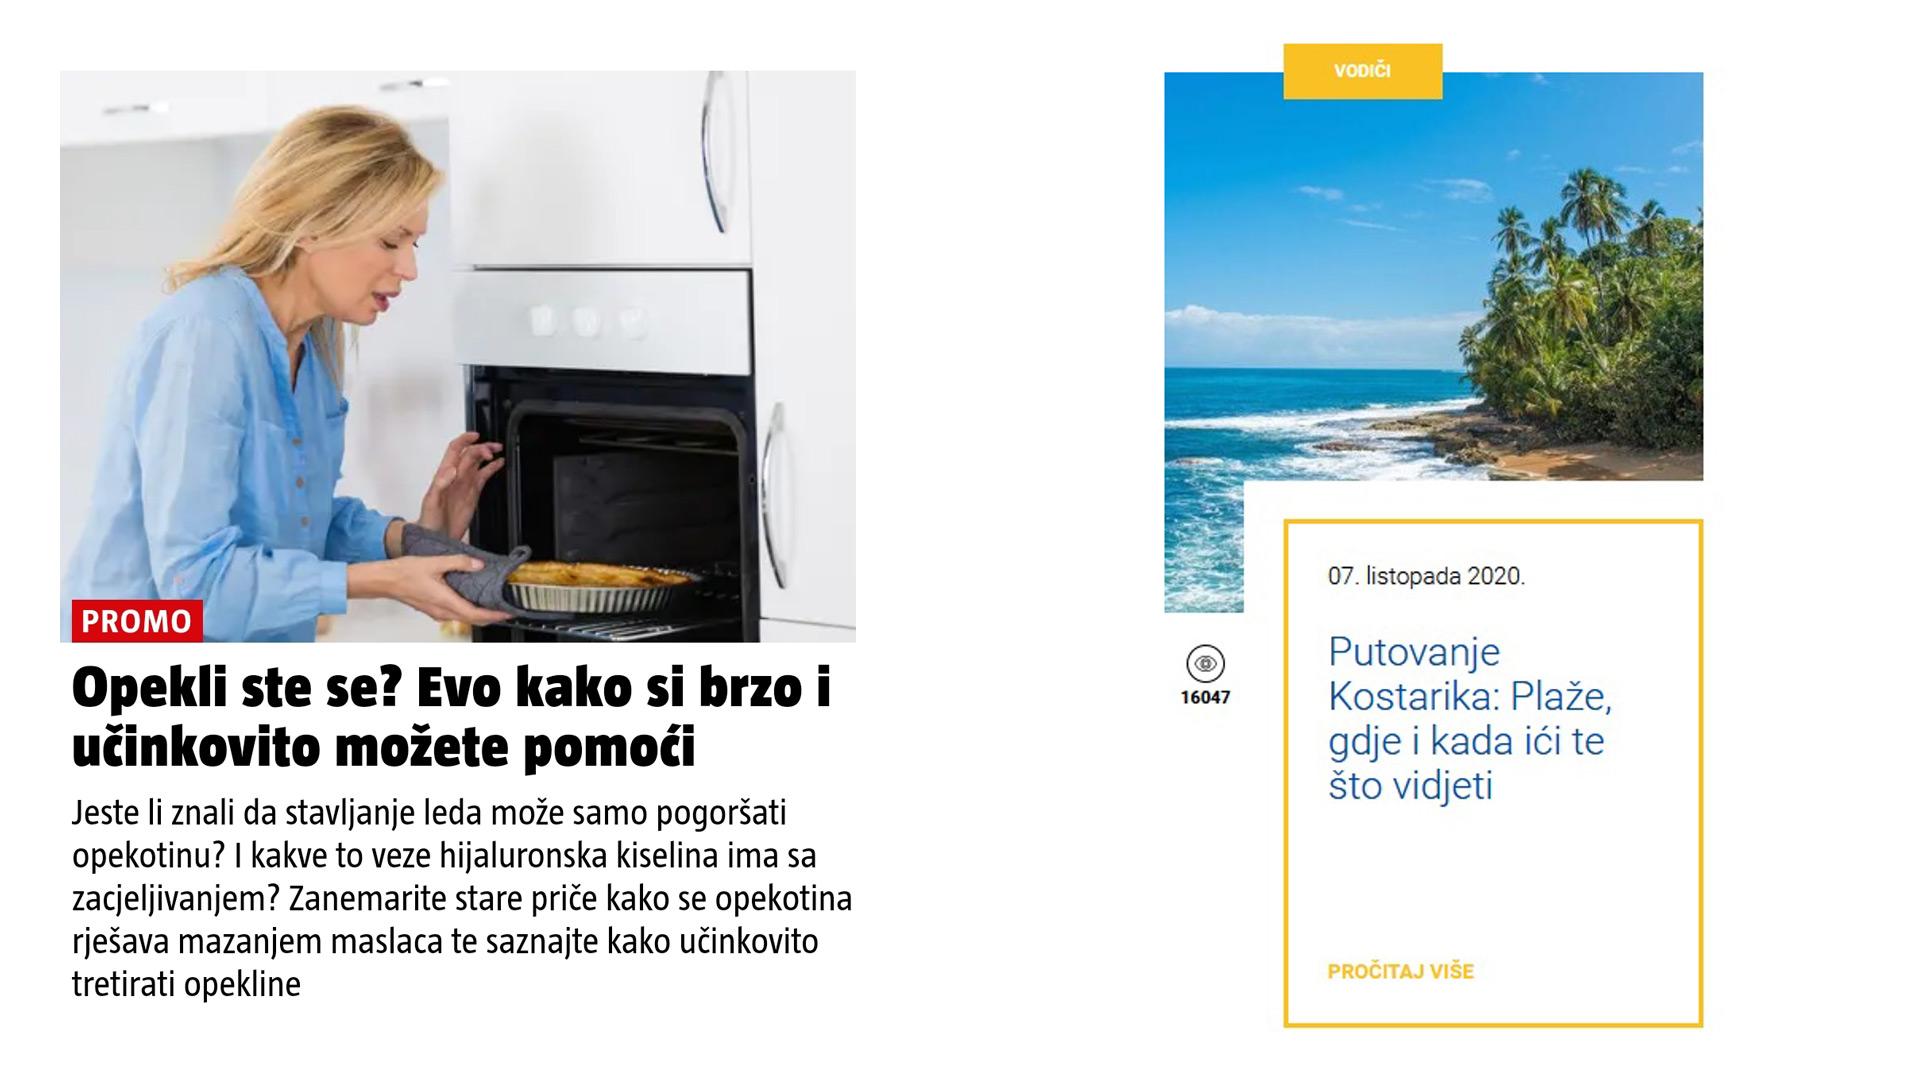 native ad i content marketing